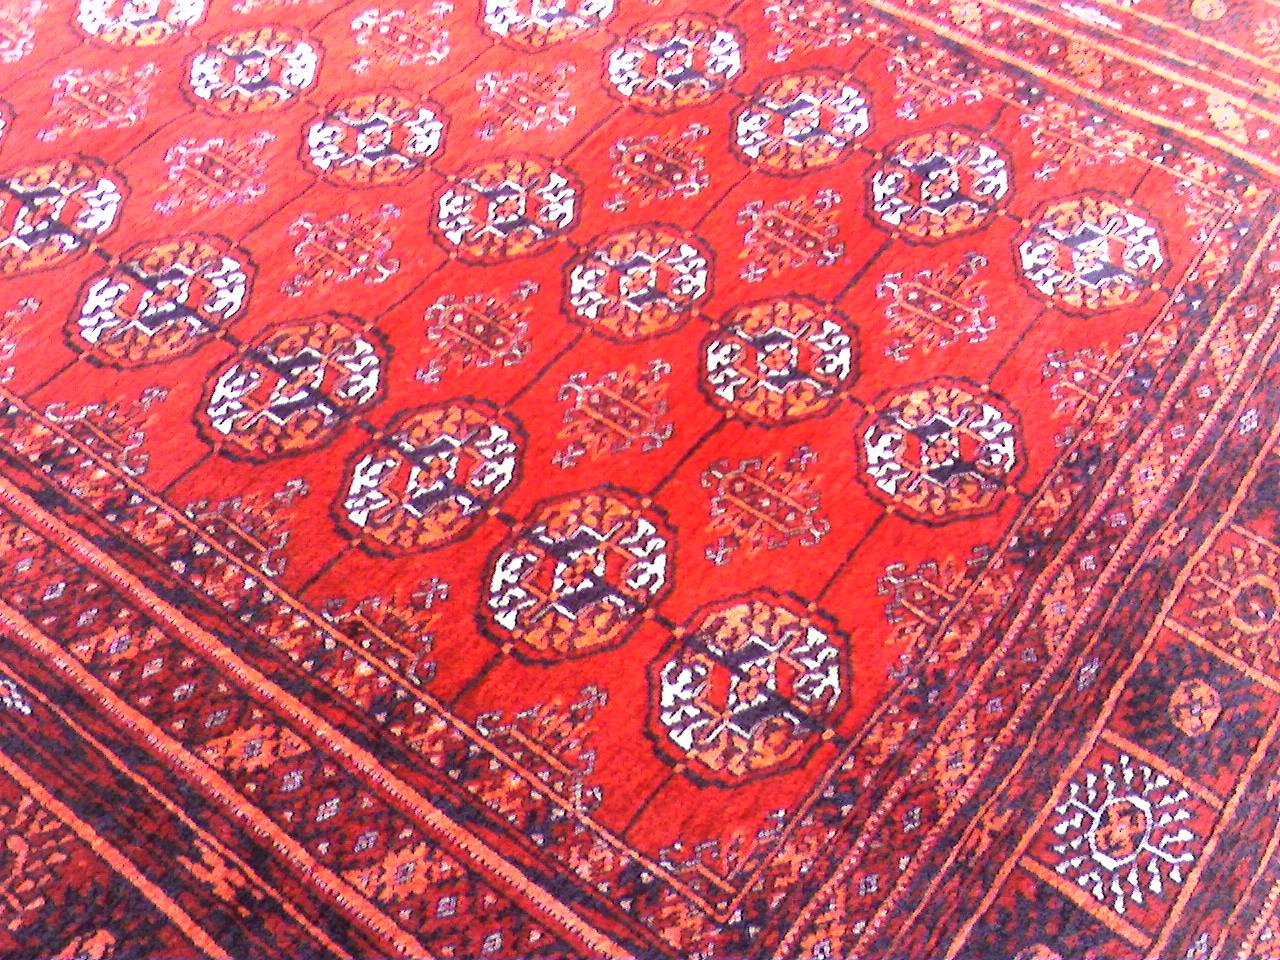 Afghancarpet1.jpg